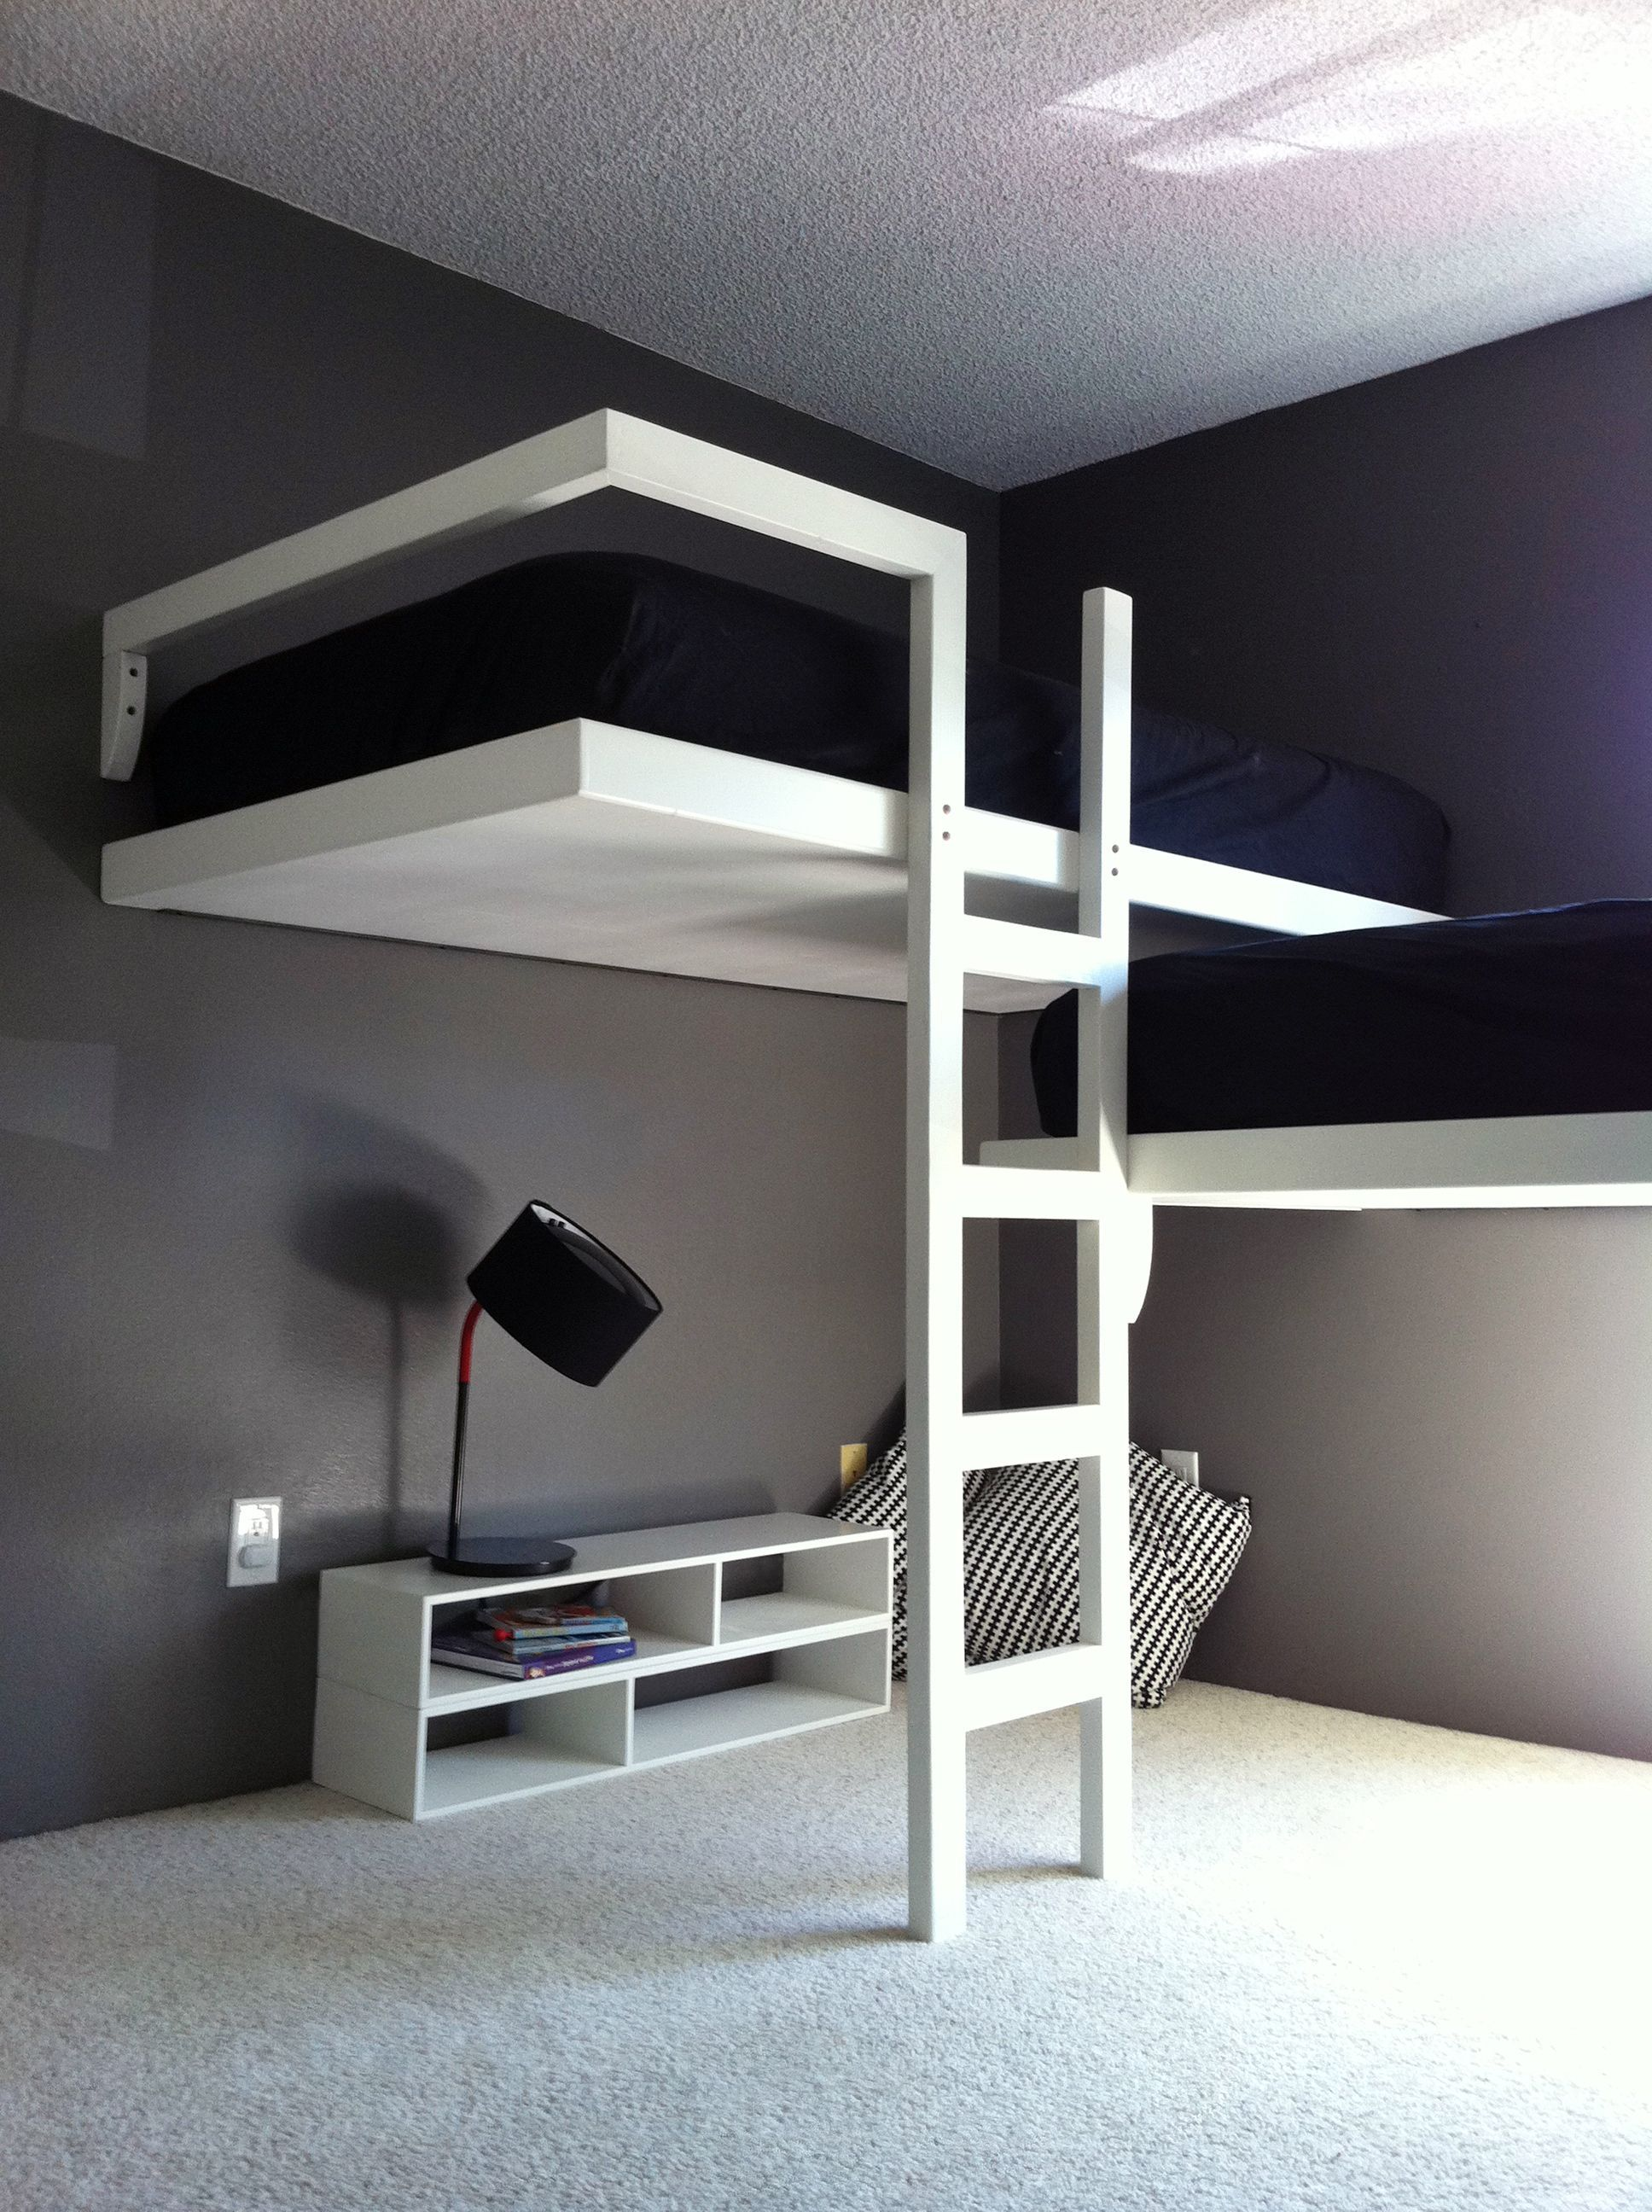 Design Fab llc. Cool puter setups and gaming loft bed setup ...